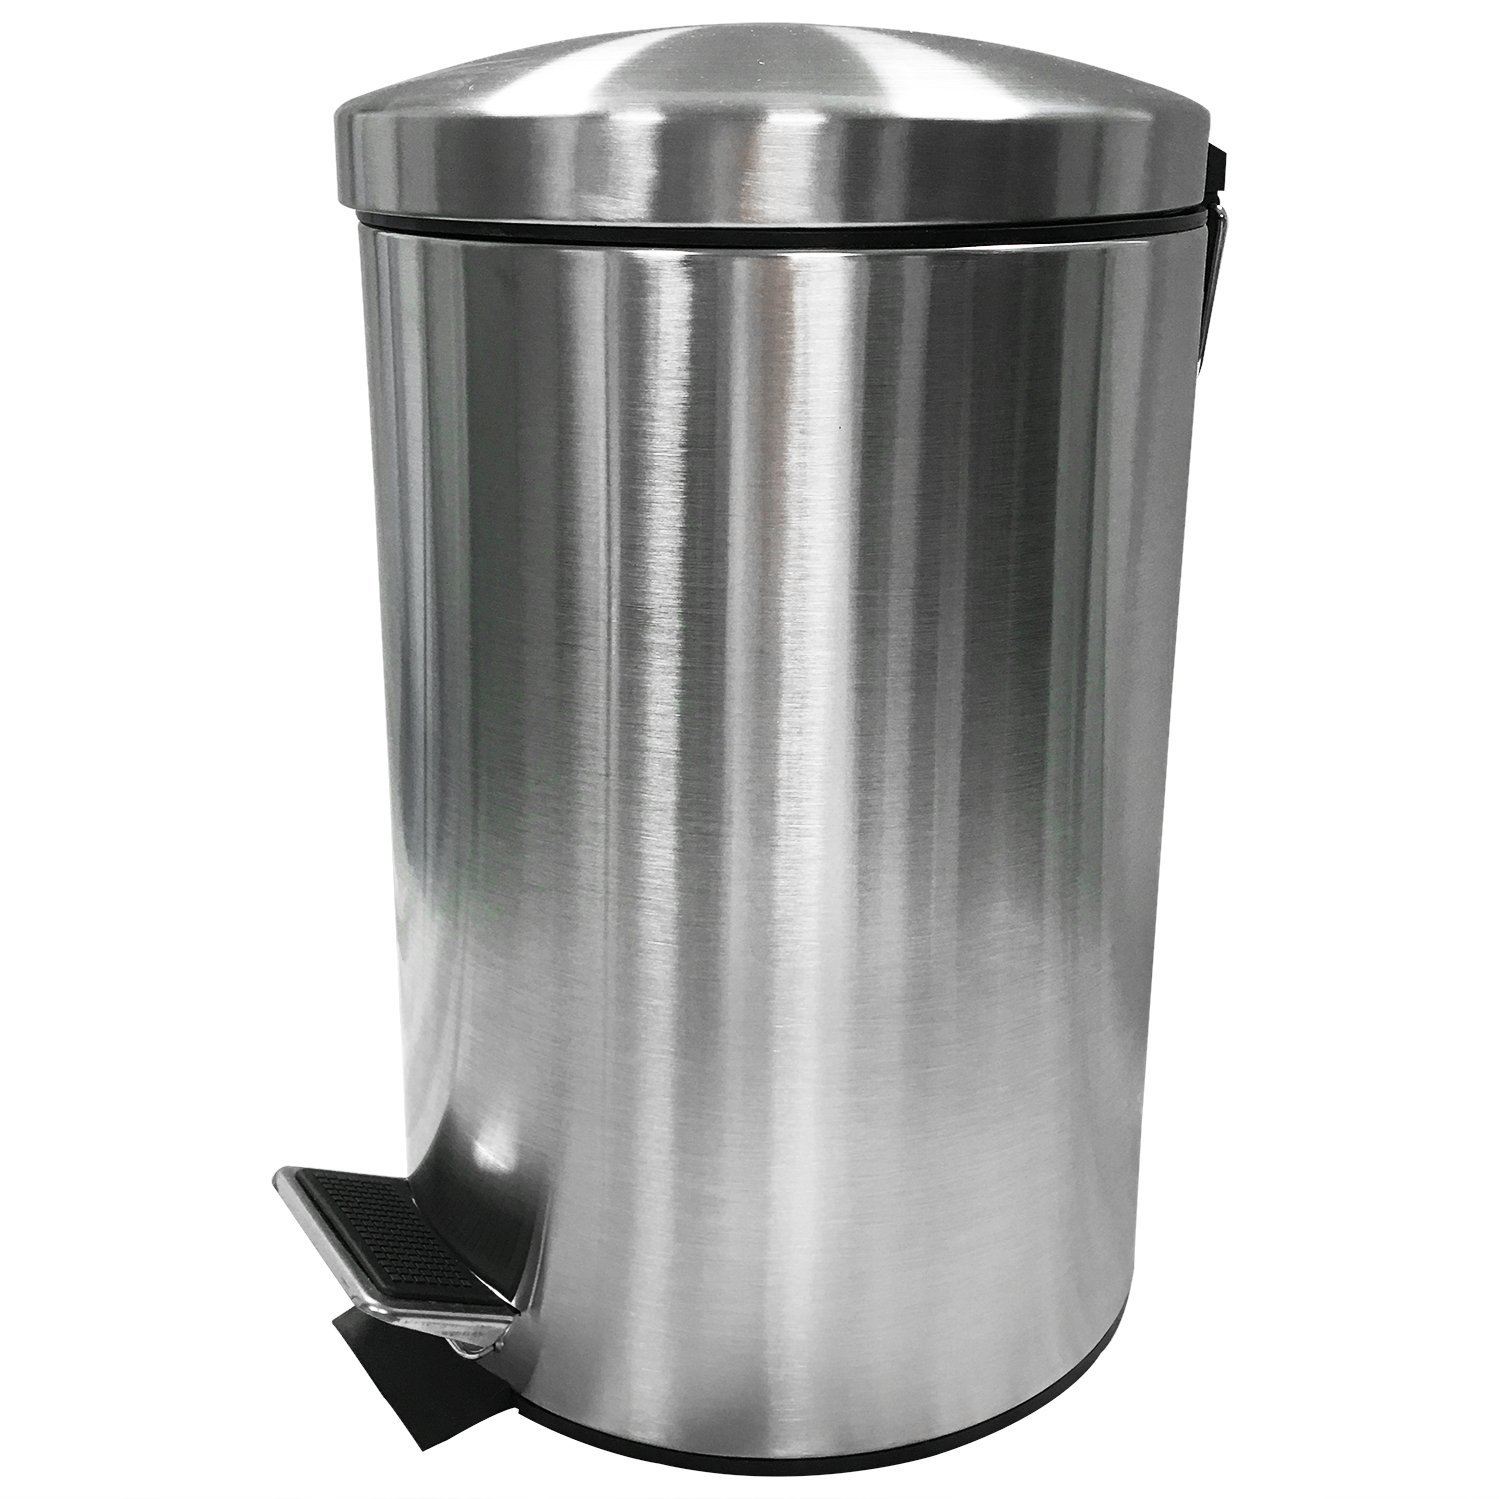 Details zu Mülleimer Abfalleimer Treteimer Müllsammler Badeimer Edelstahl  Küche #463